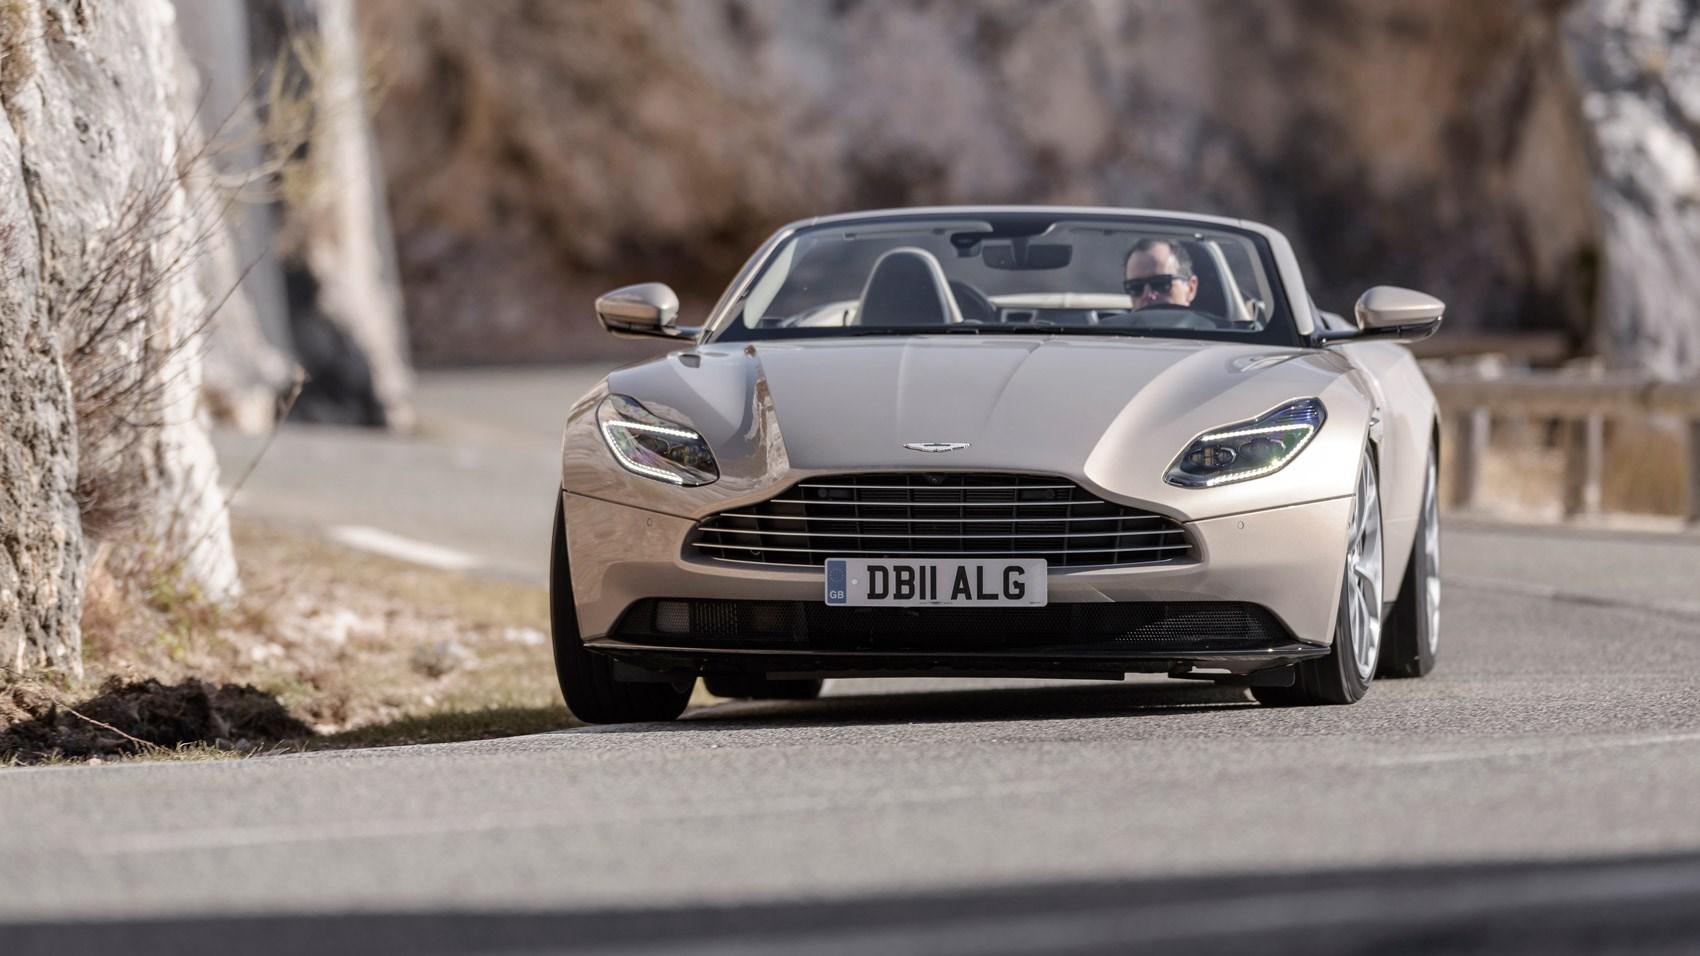 Aston Martin Db11 Volante Review 2018 Car Magazine